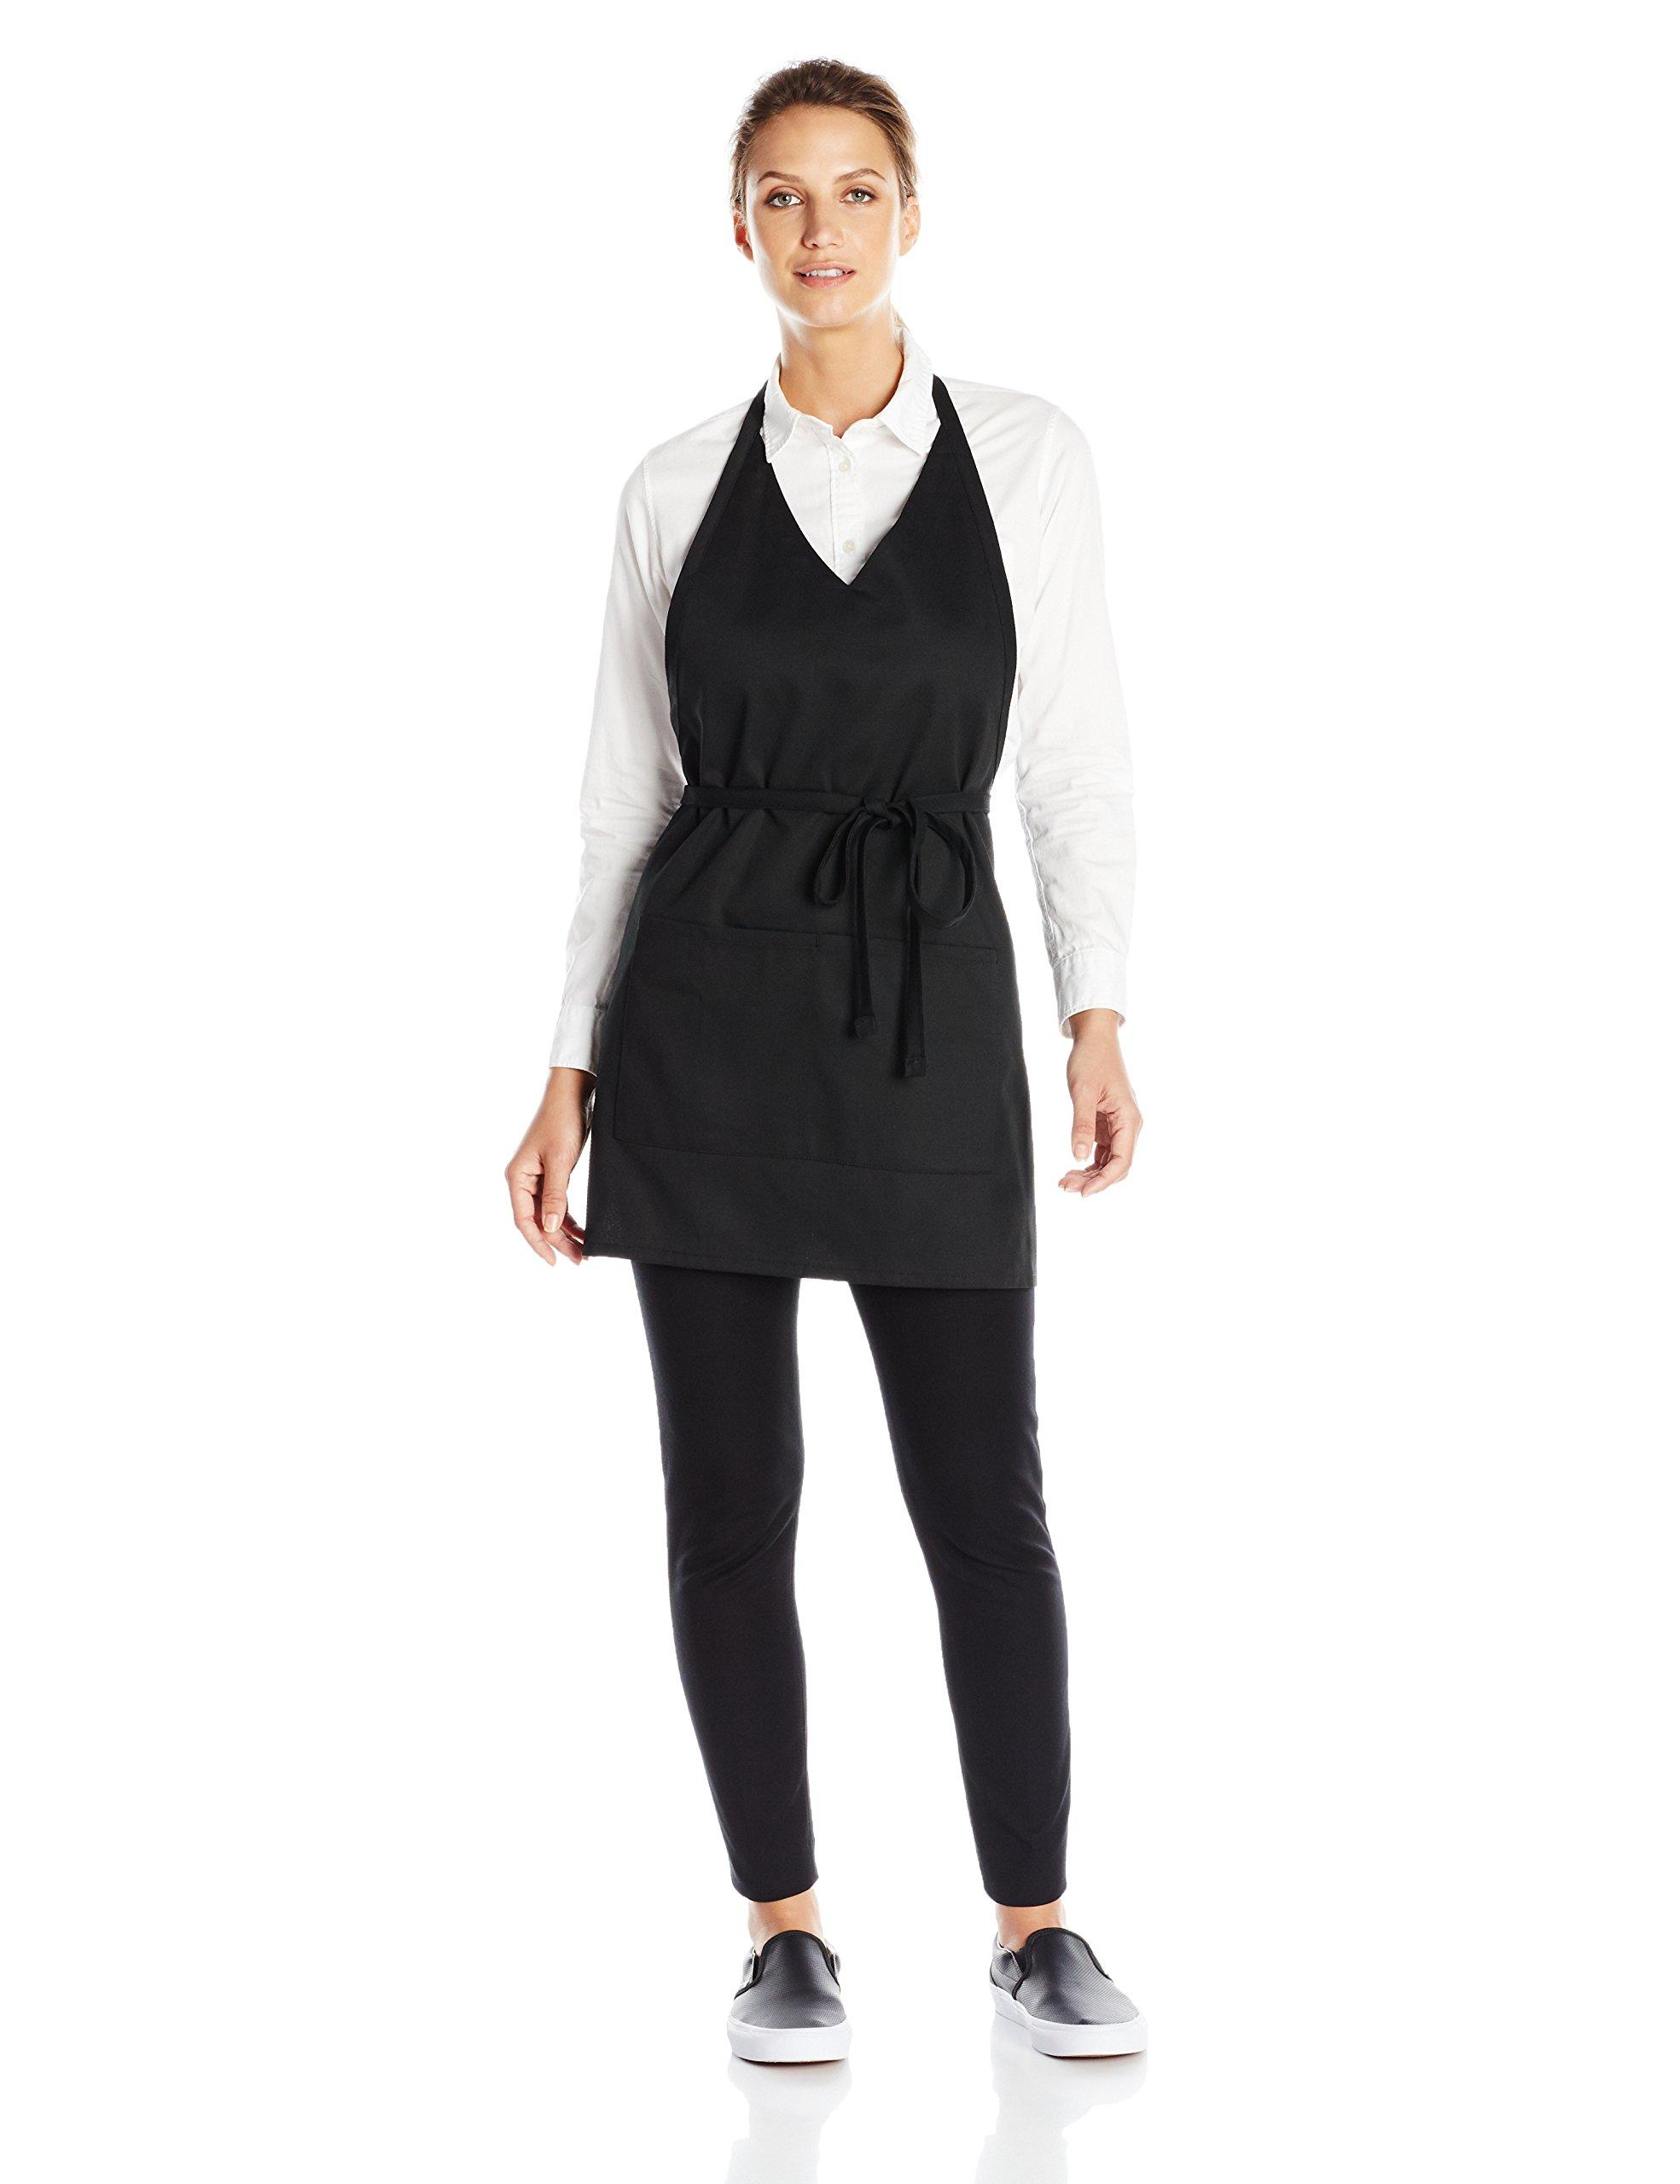 Uncommon Threads Unisex V-Neck Formal Apron, Black, One Size